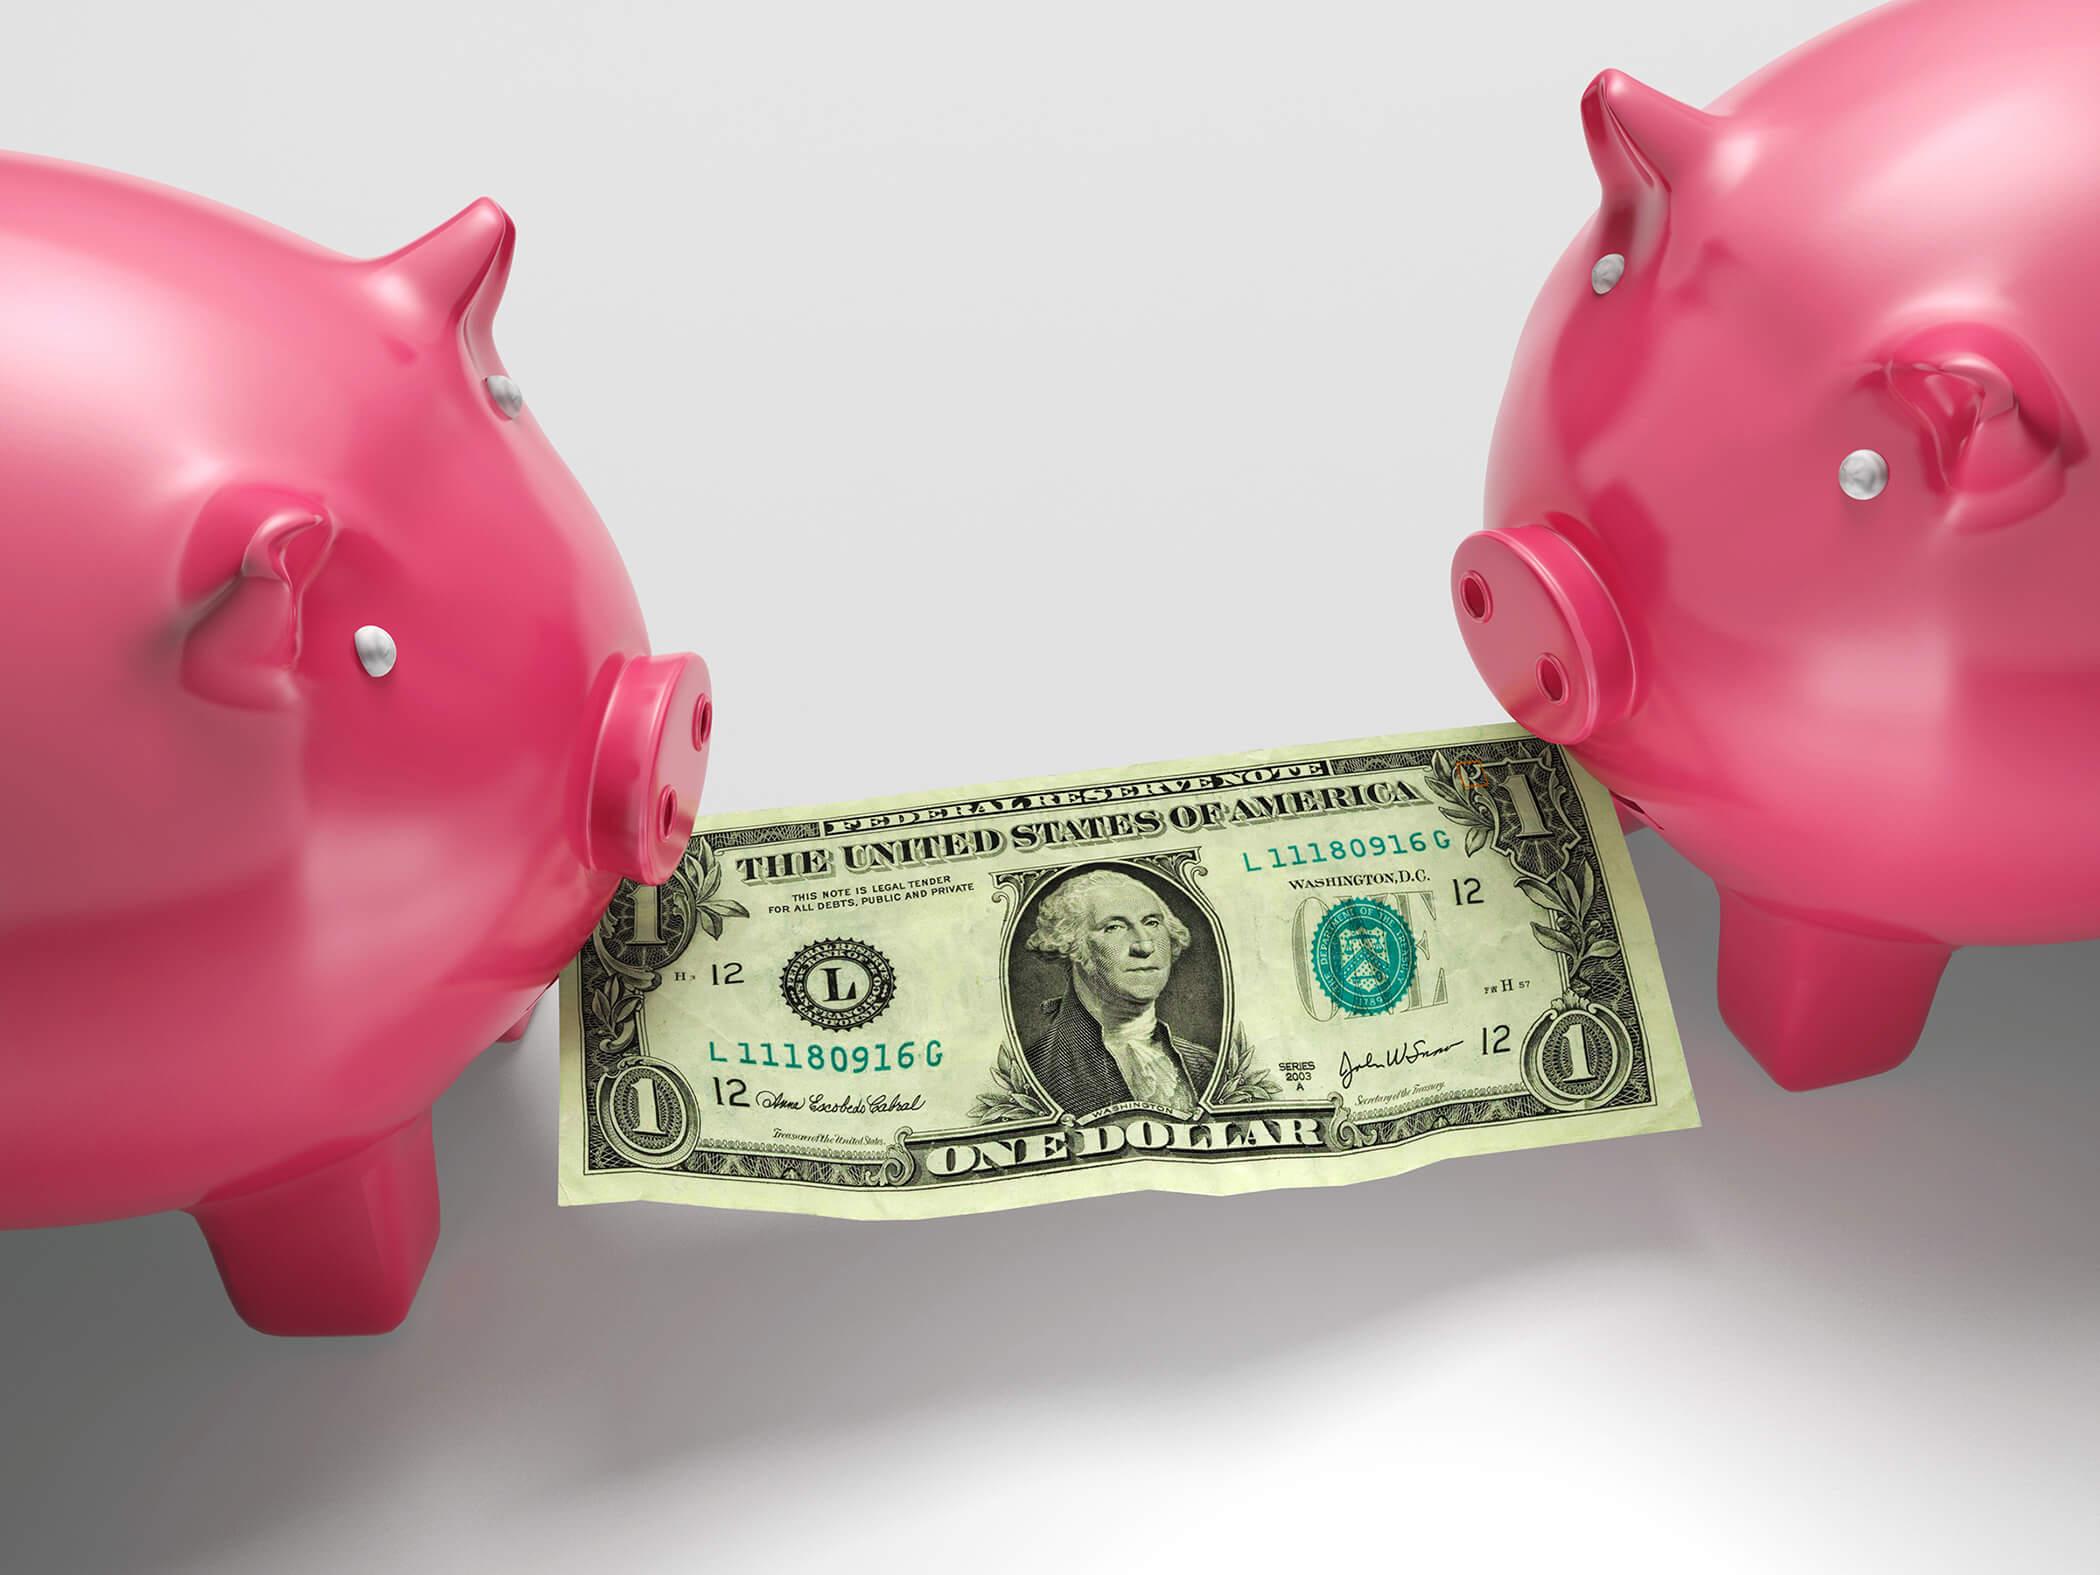 Piggybanks Eating Money Shows Financial Crisis Or Monetary Fraud